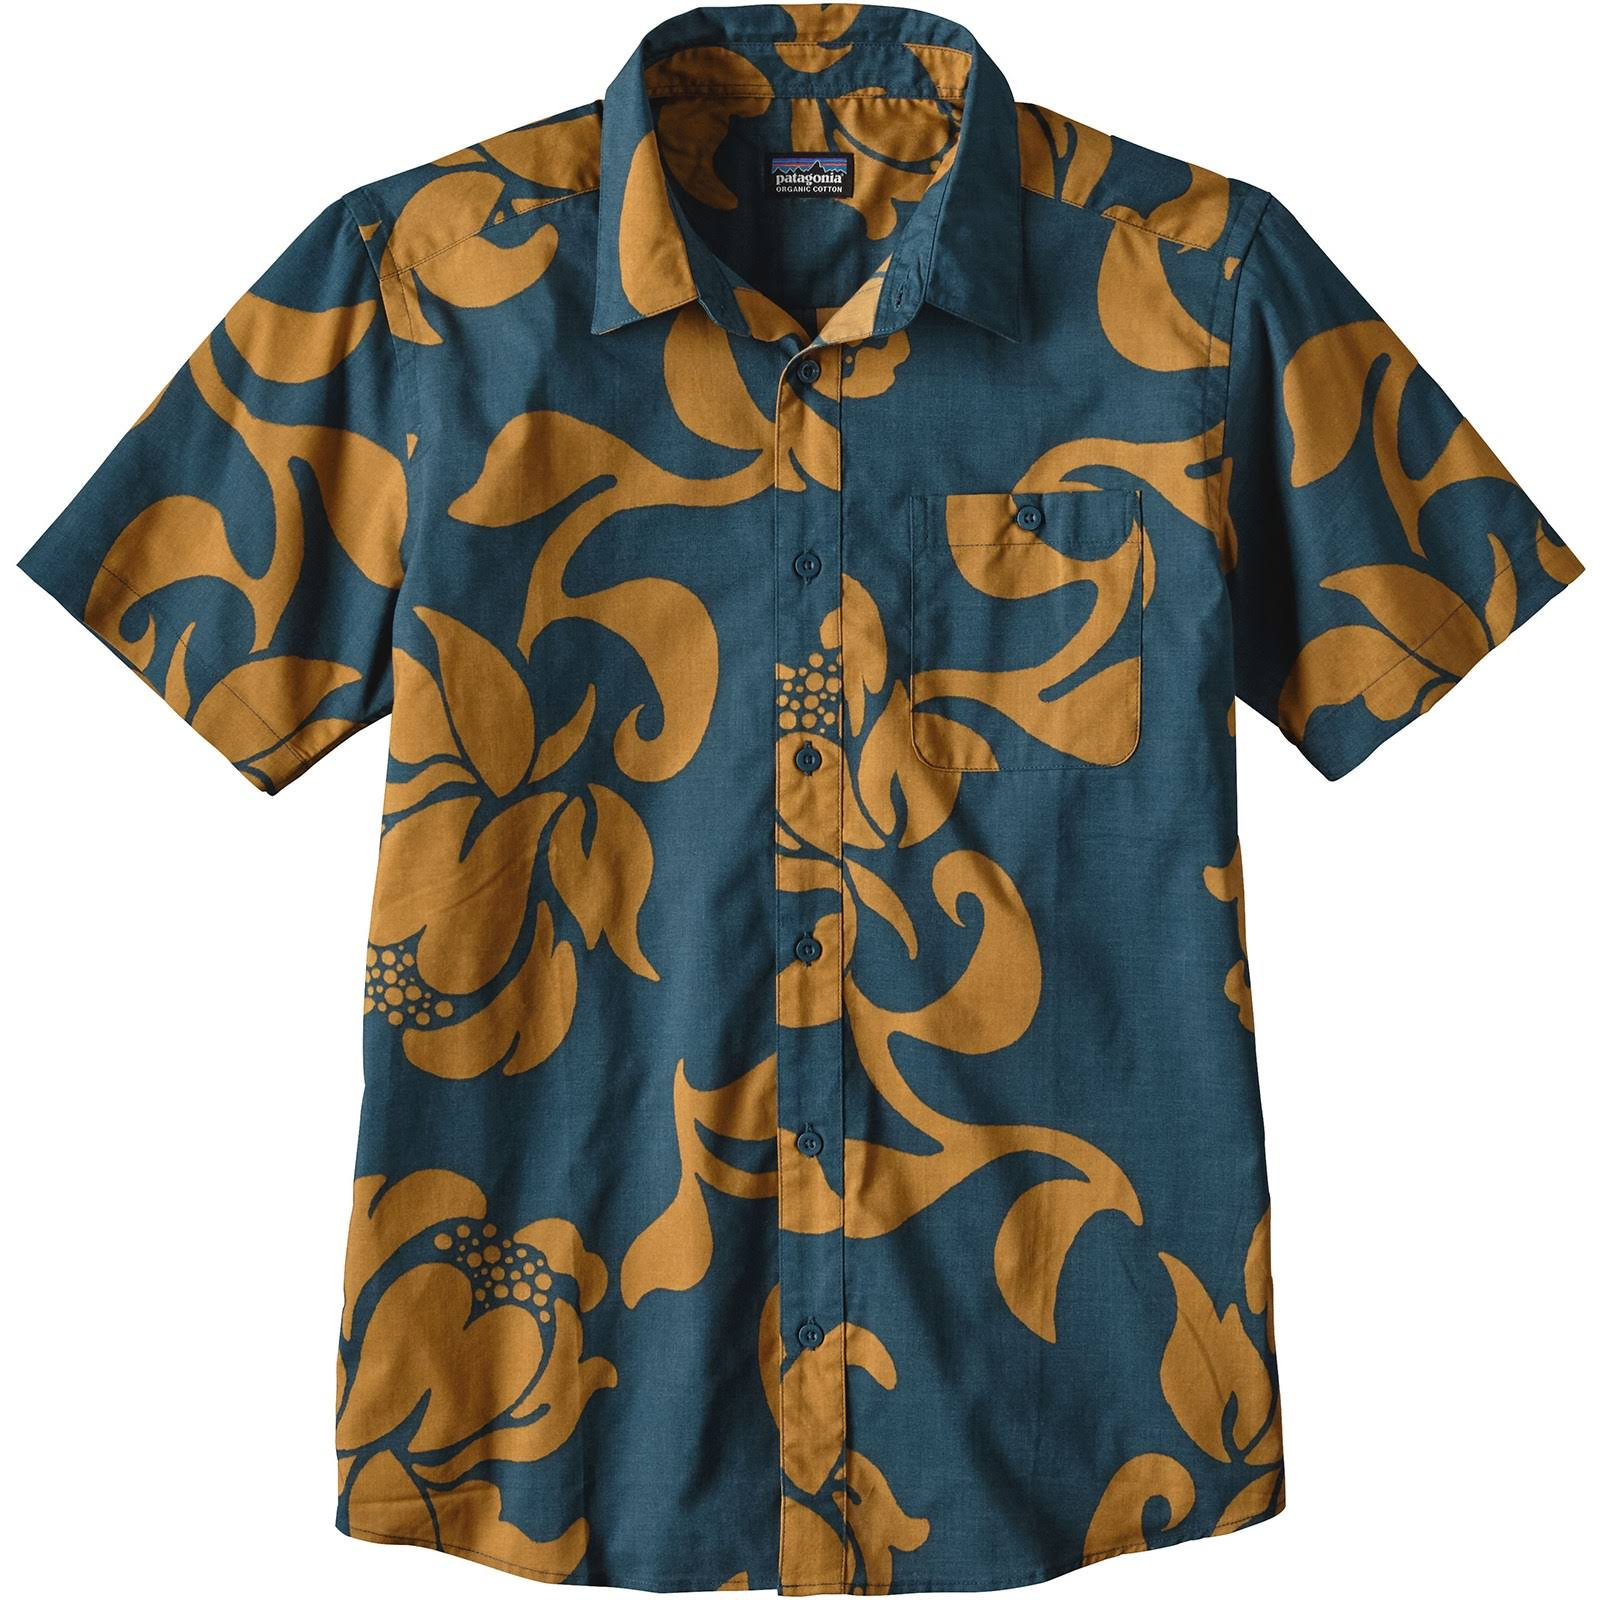 Exotic Patagonia Blue To Bay Mittel Go Floral Herren Shirt qwPXp4Fw